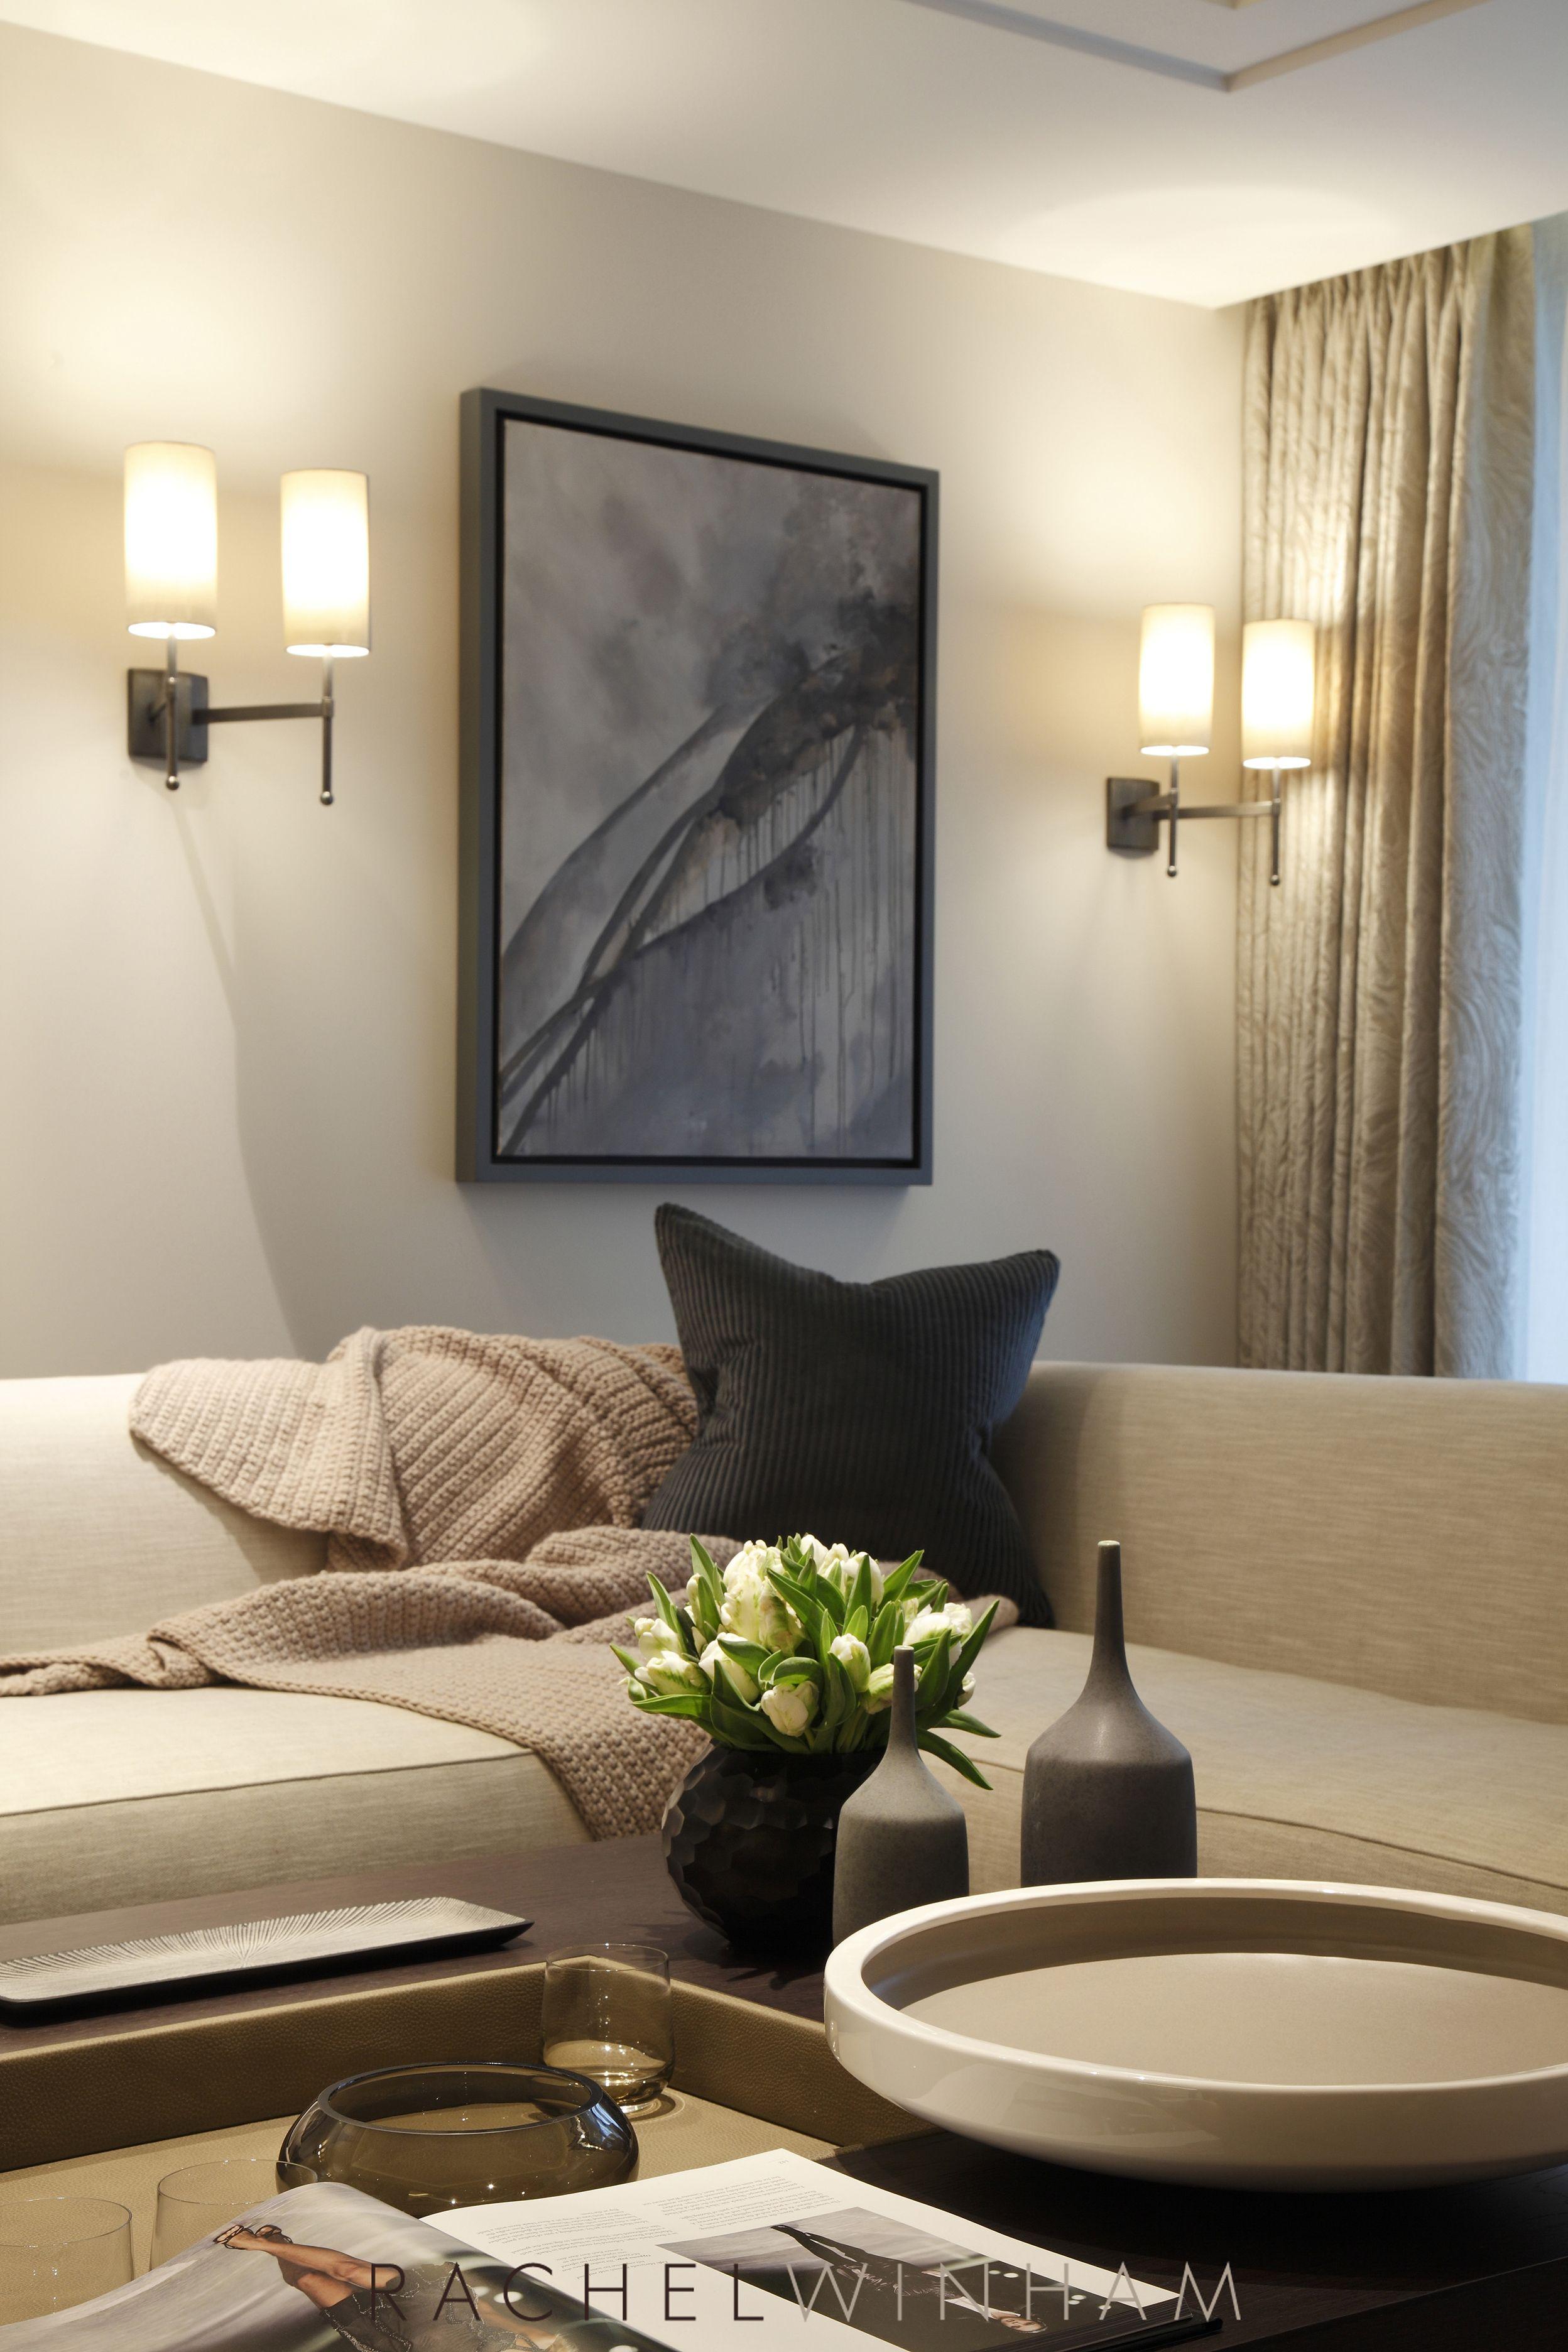 Pin de arturo guzman en ideas para el hogar dise o de for Diseno decoracion hogar talagante